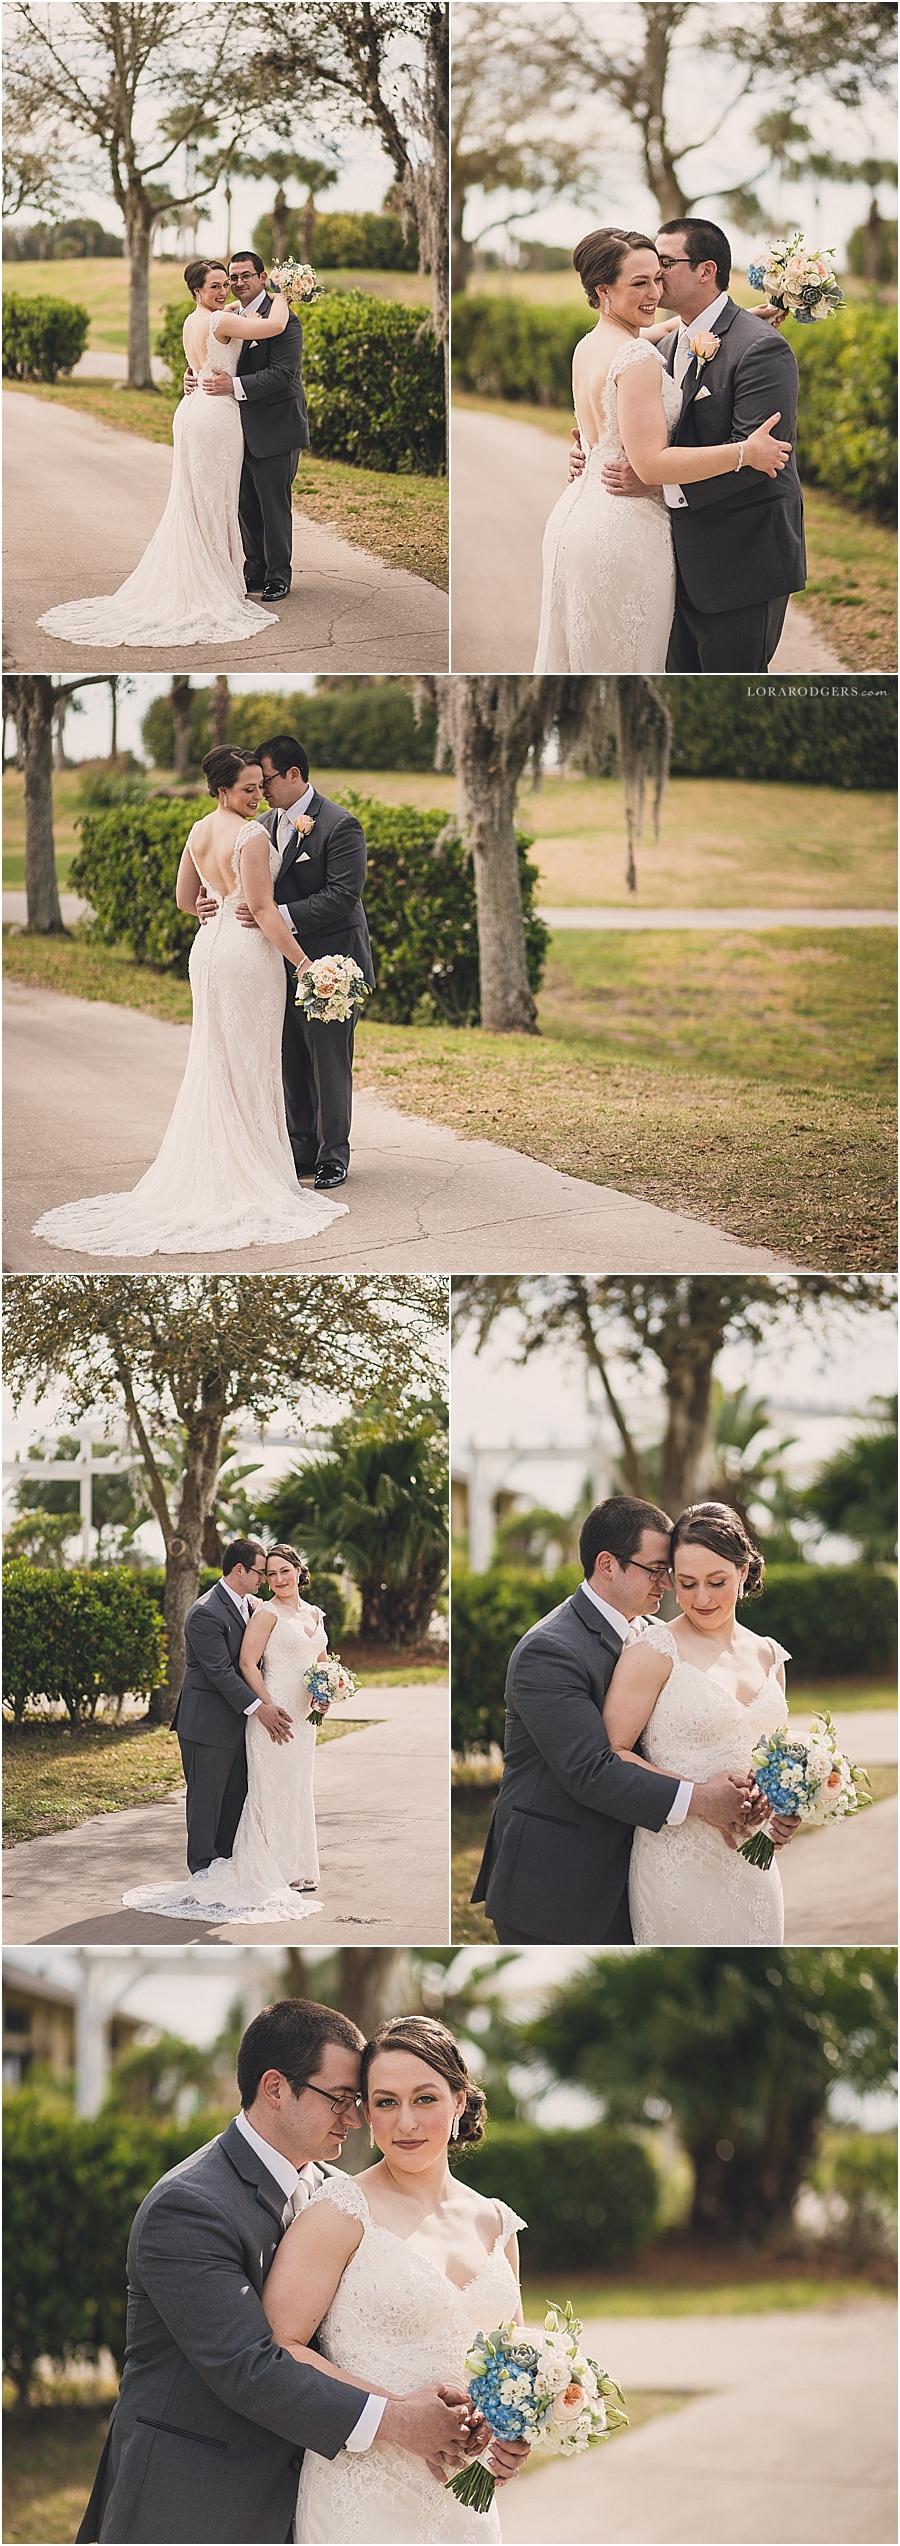 Stoneybrook_West_Orlando_Florida_Wedding_006